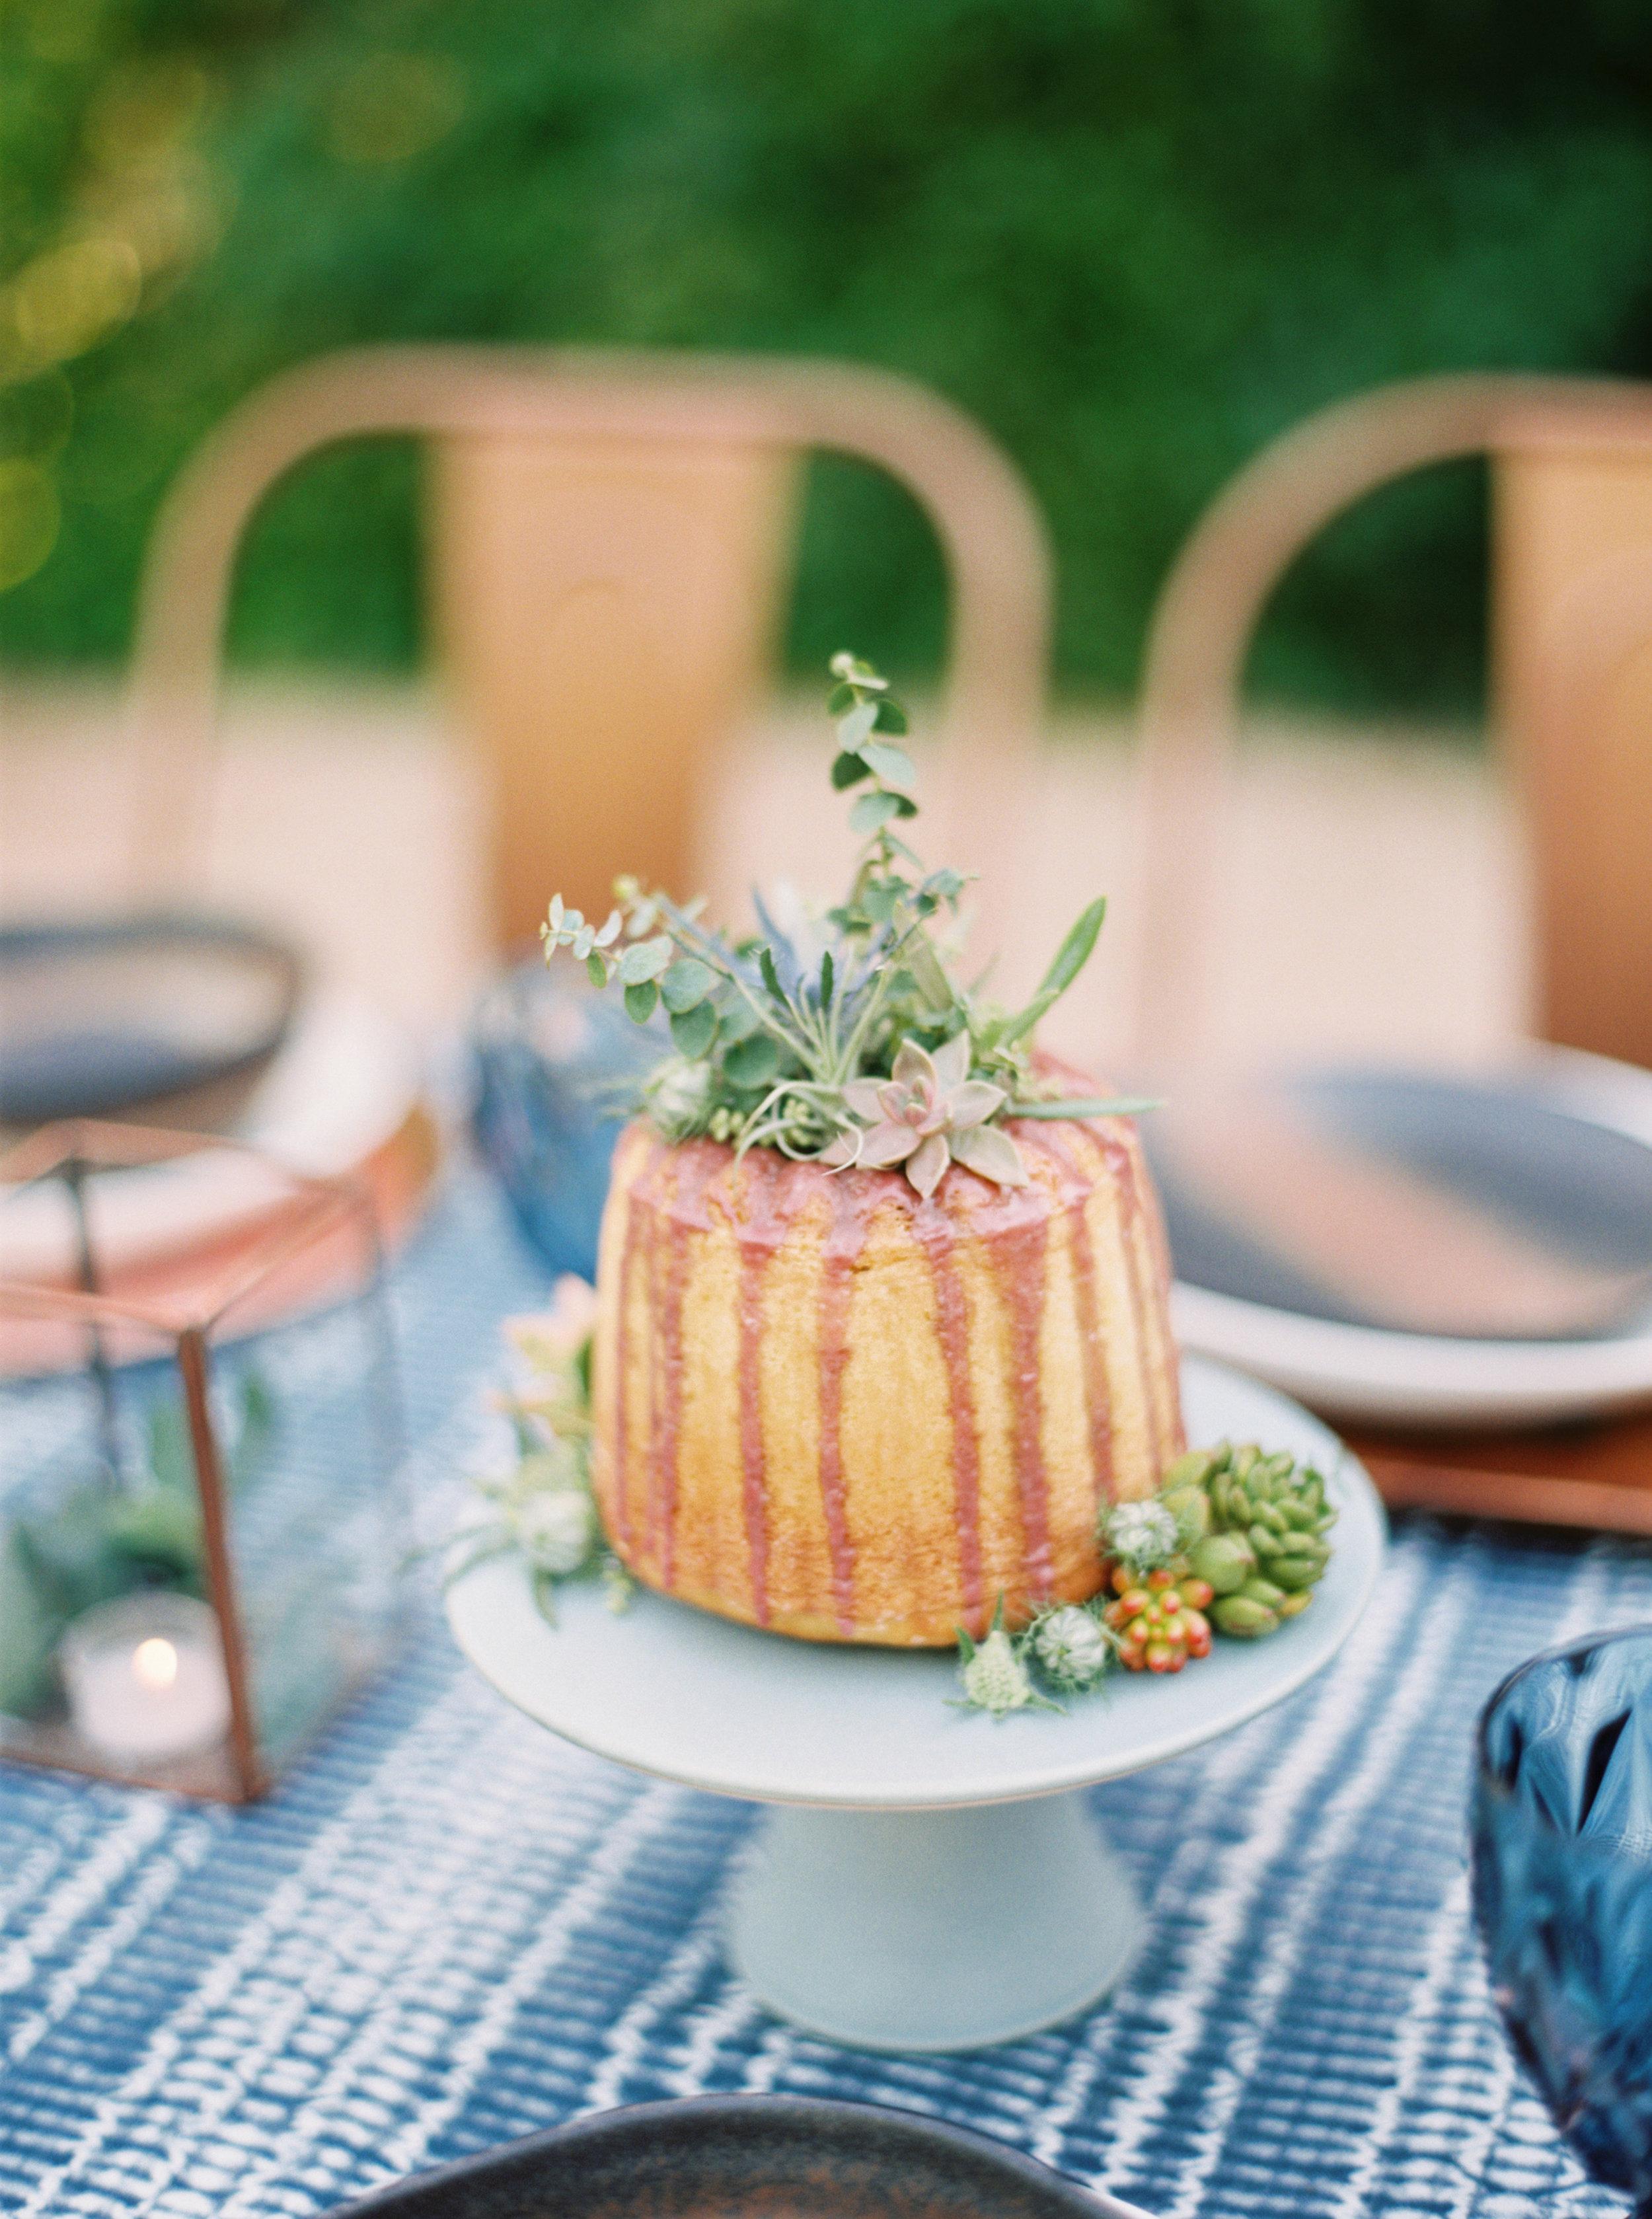 Blueberry Drip Cake-Bundt-succulent cake- Cake Bloom-Emily March Payne Photography